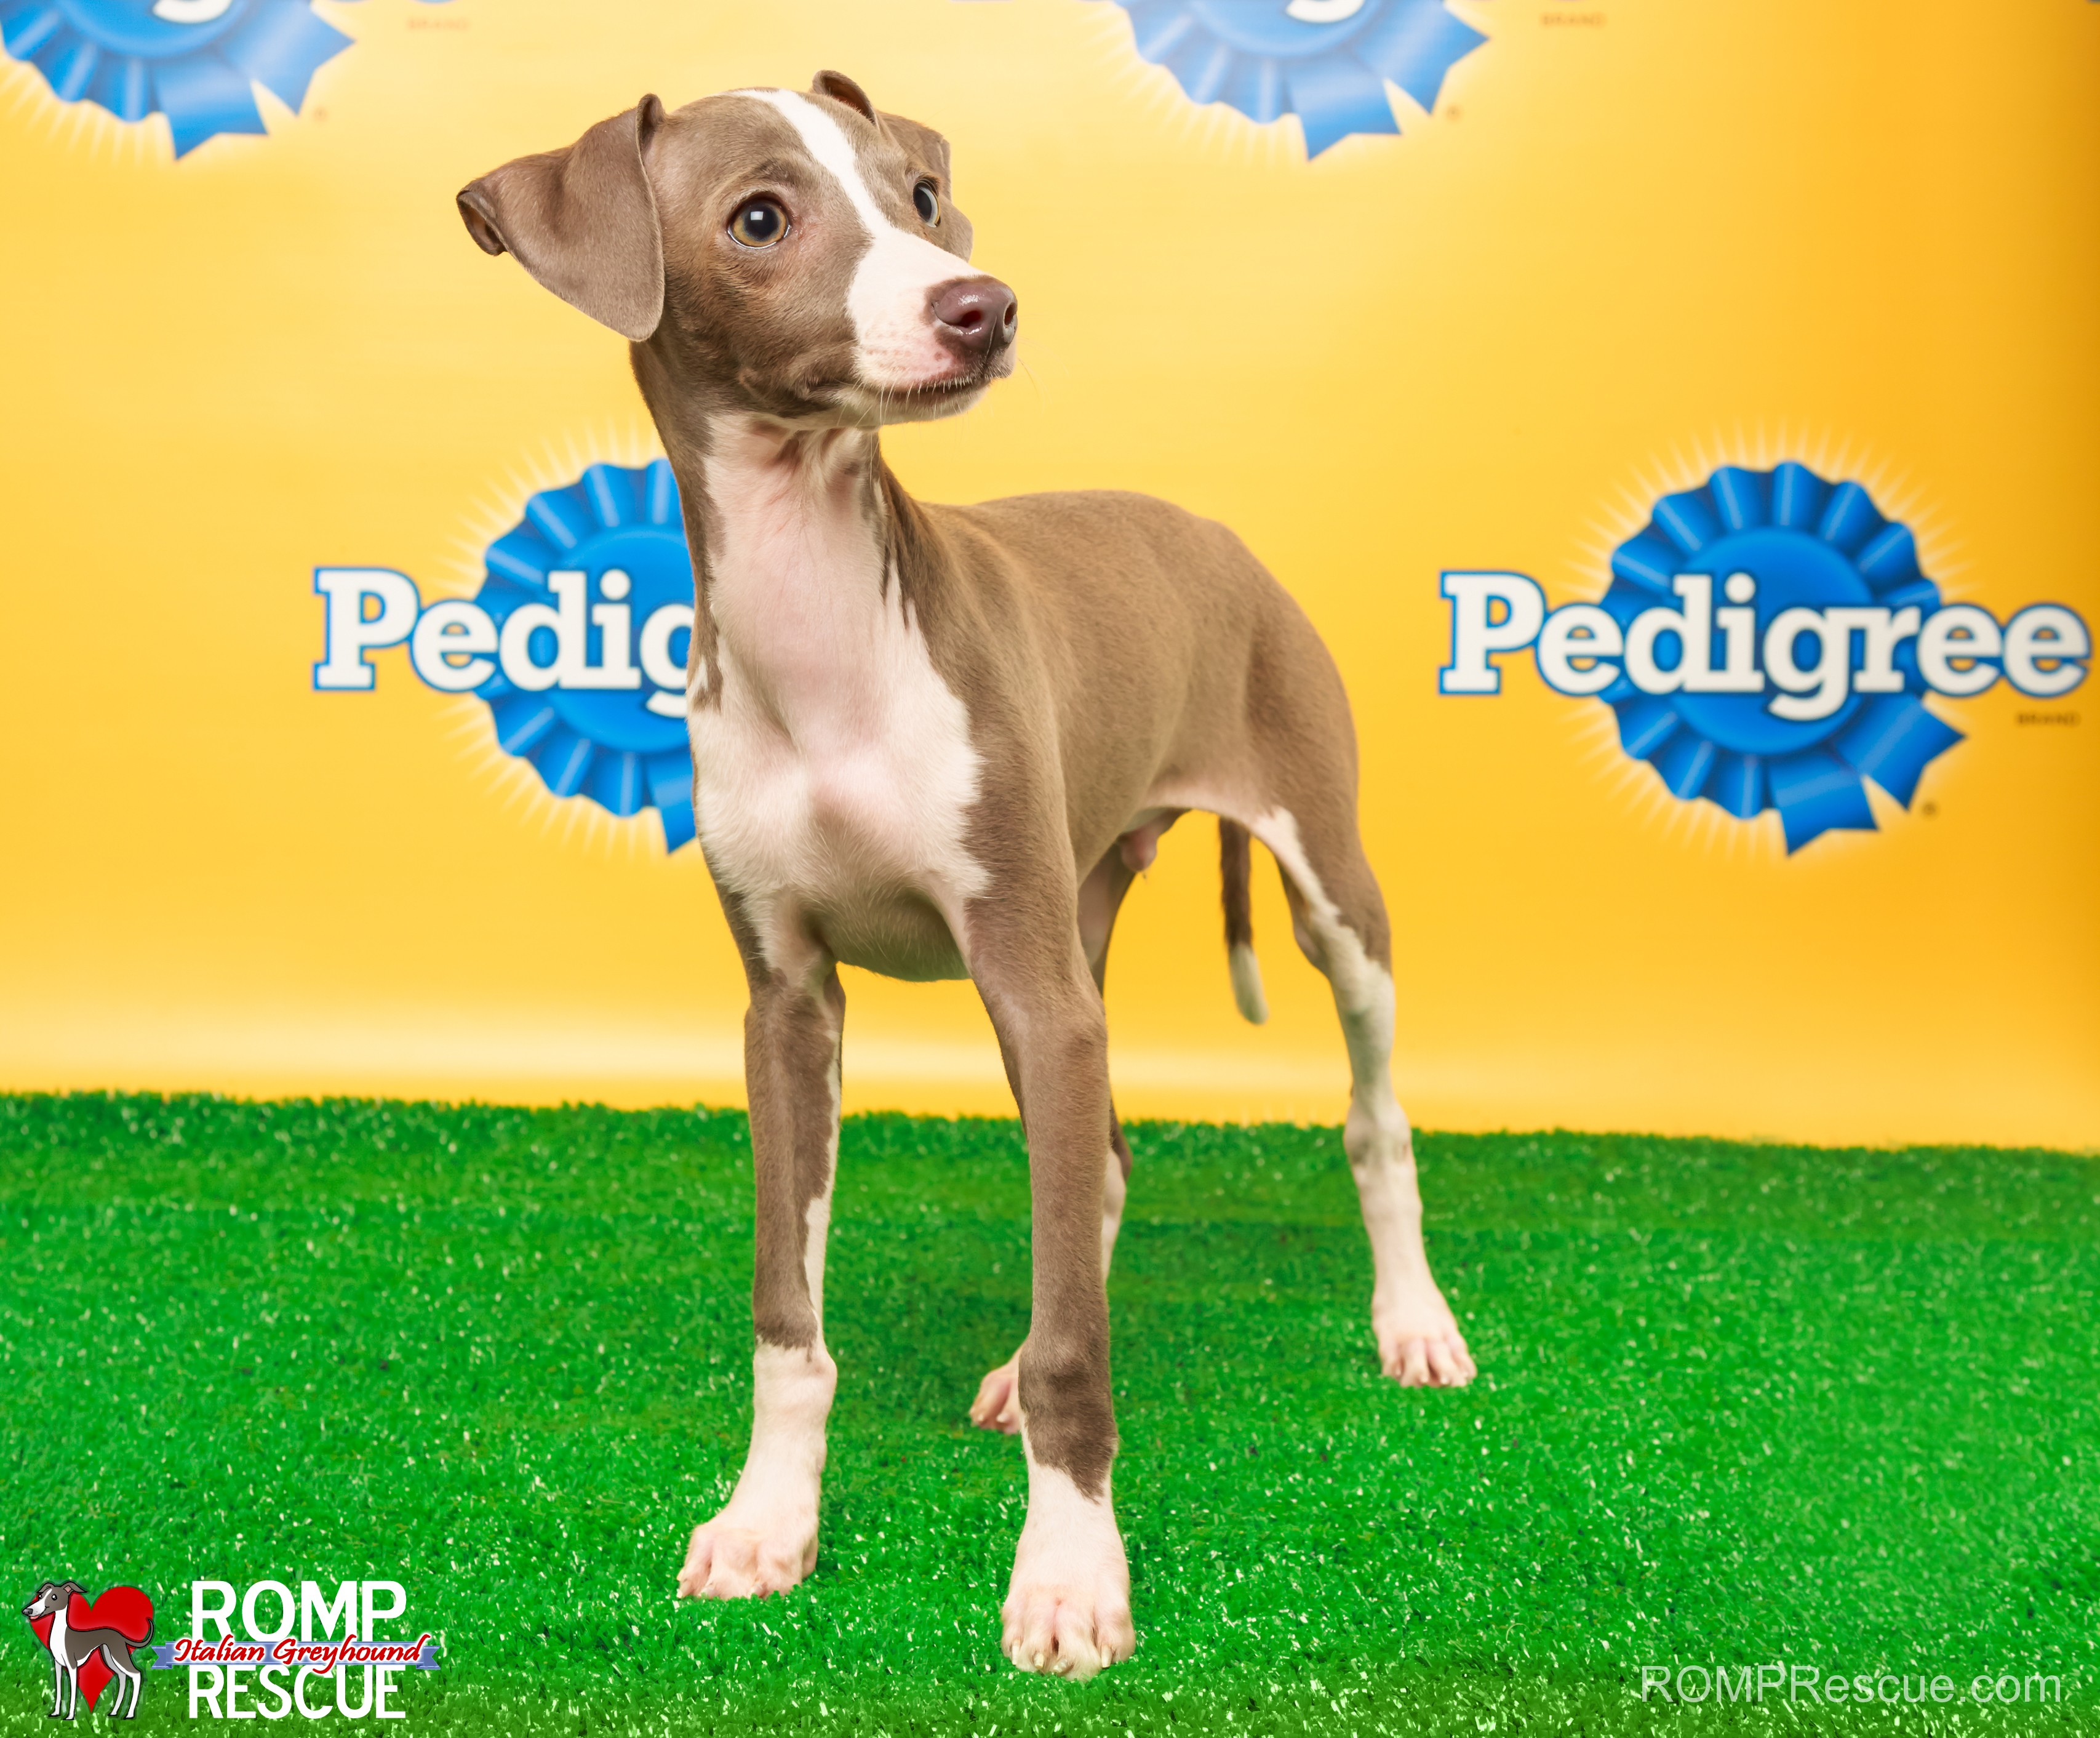 Animal Planet, puppy bowl x, italian greyhound, puppy bowl, iggy, sharpie, romp rescue, chicago, illinois